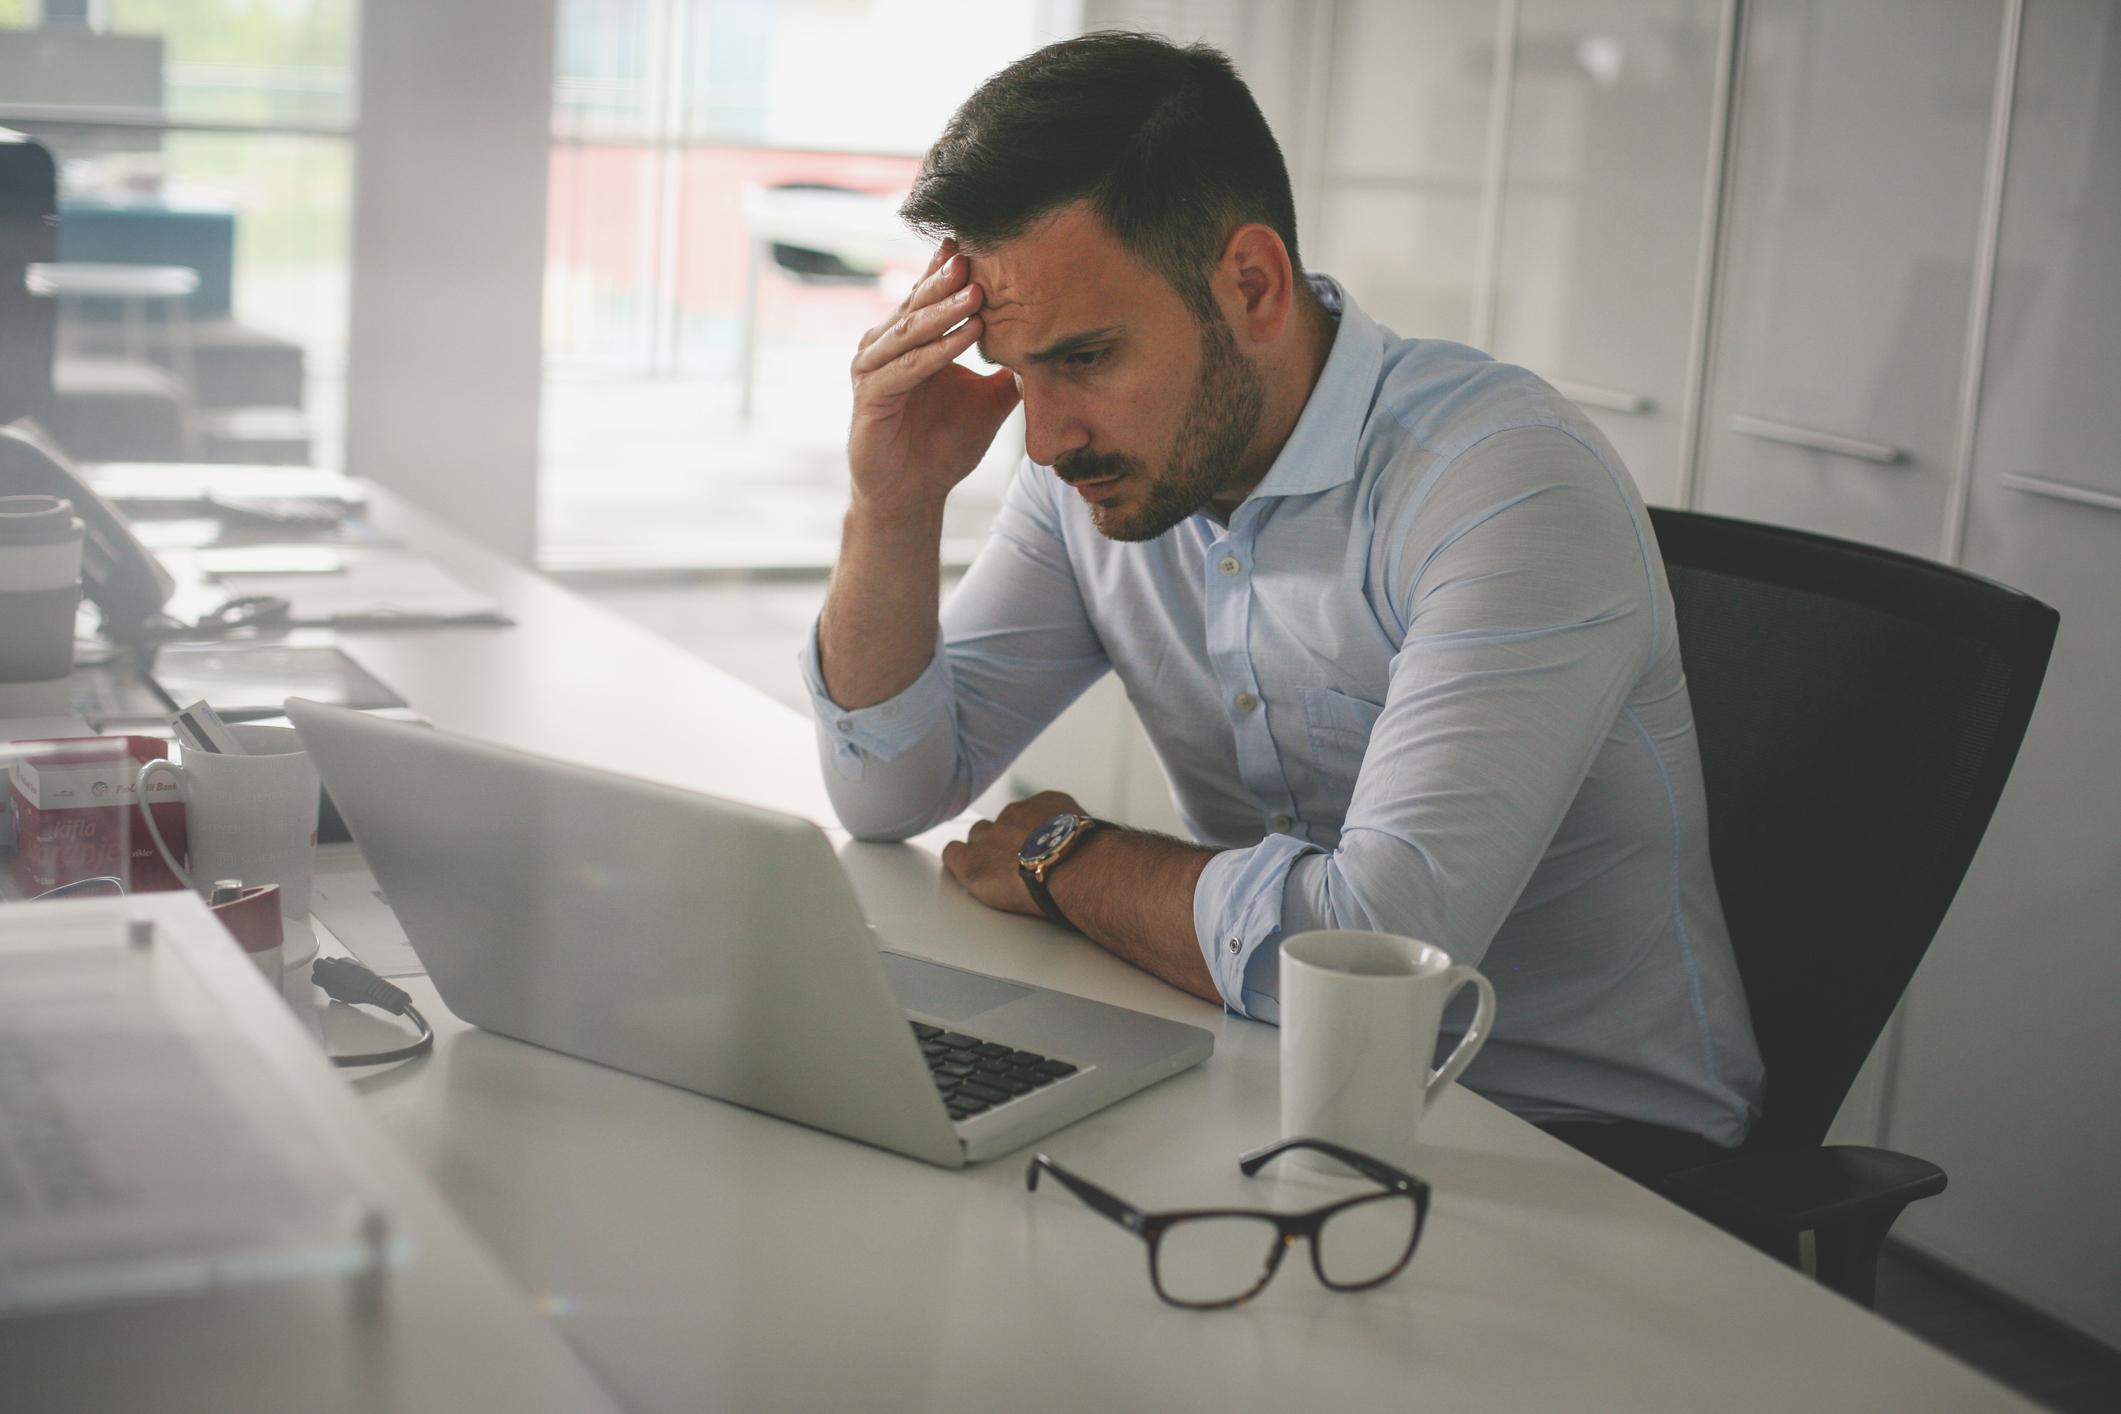 Man in front of laptop looking upset.